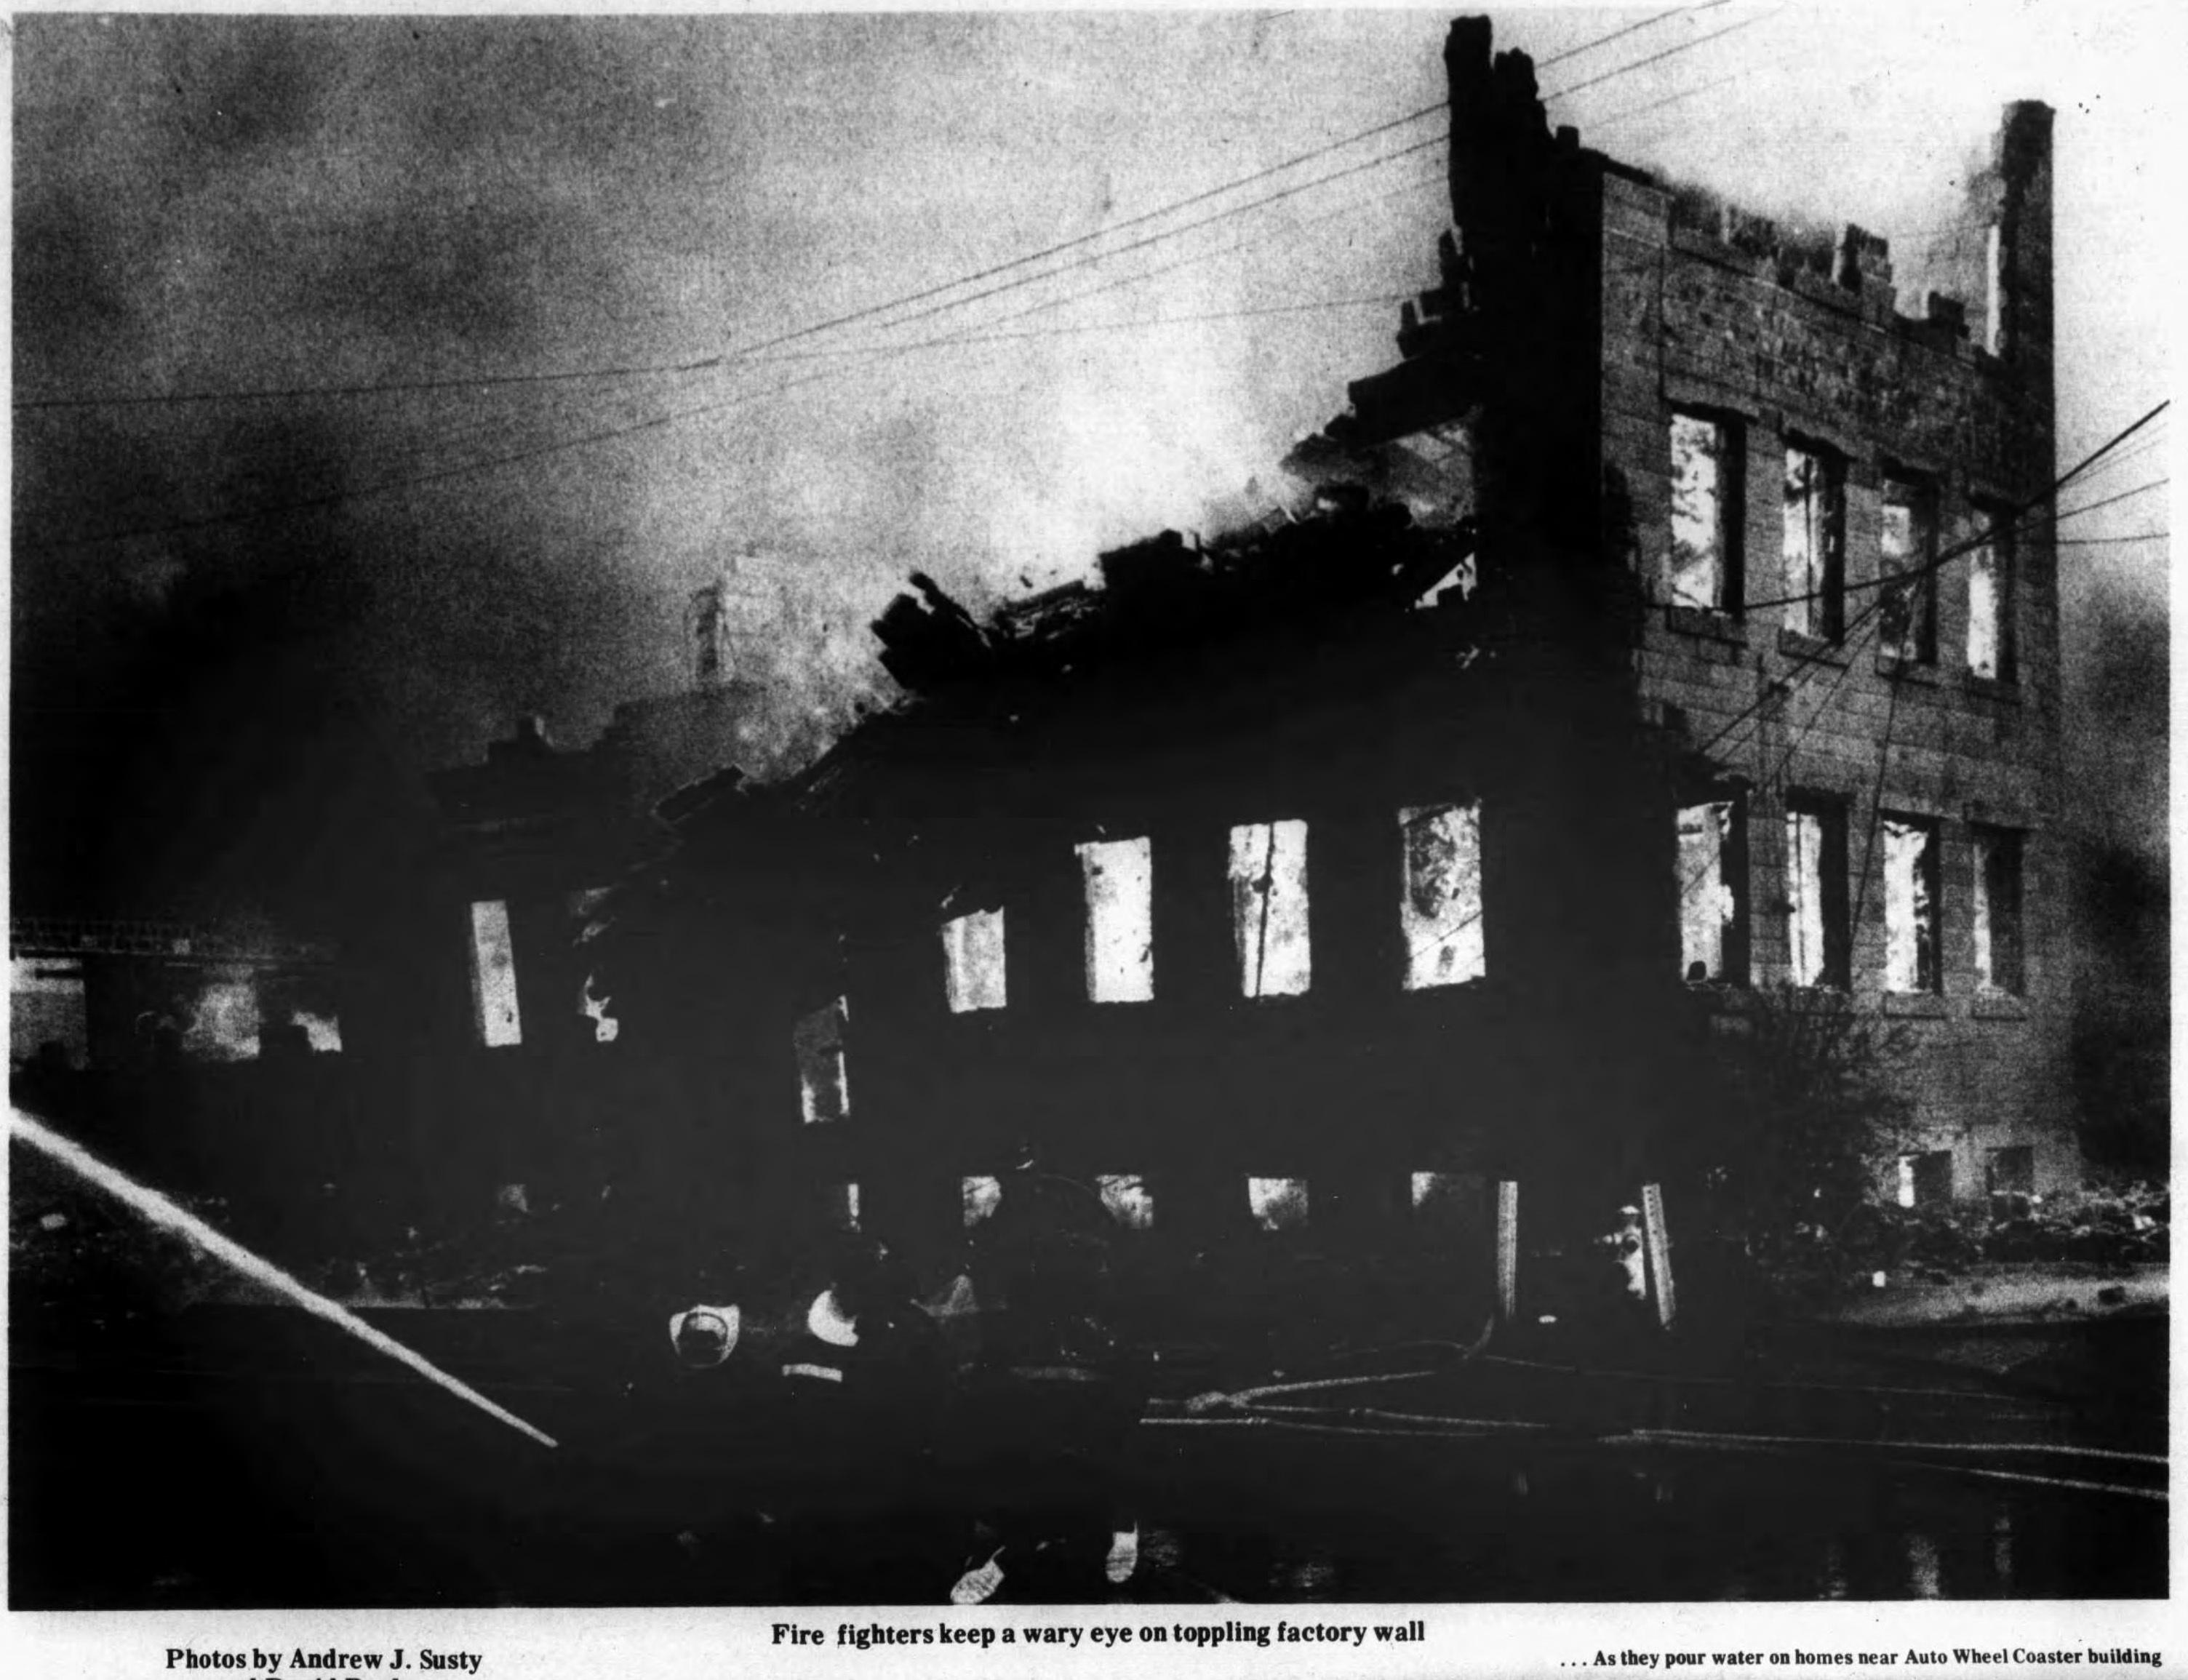 Firefighters keep eye on toppling factory wall, photo (Tonawanda News, 1972-05-30).jpg